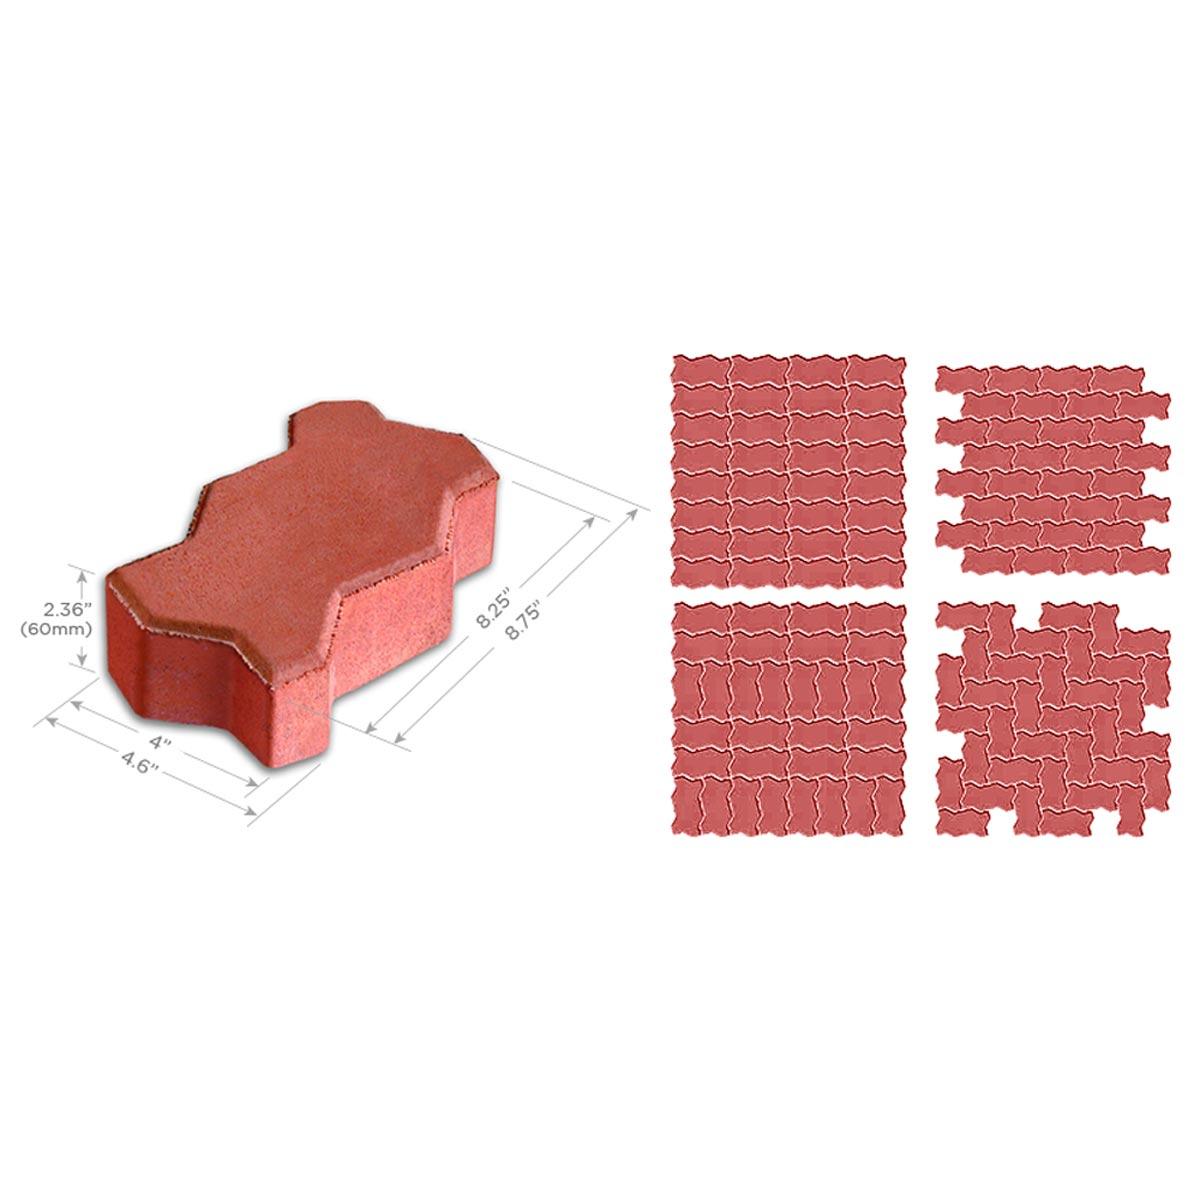 Interlocking Red Concrete Wave Paver